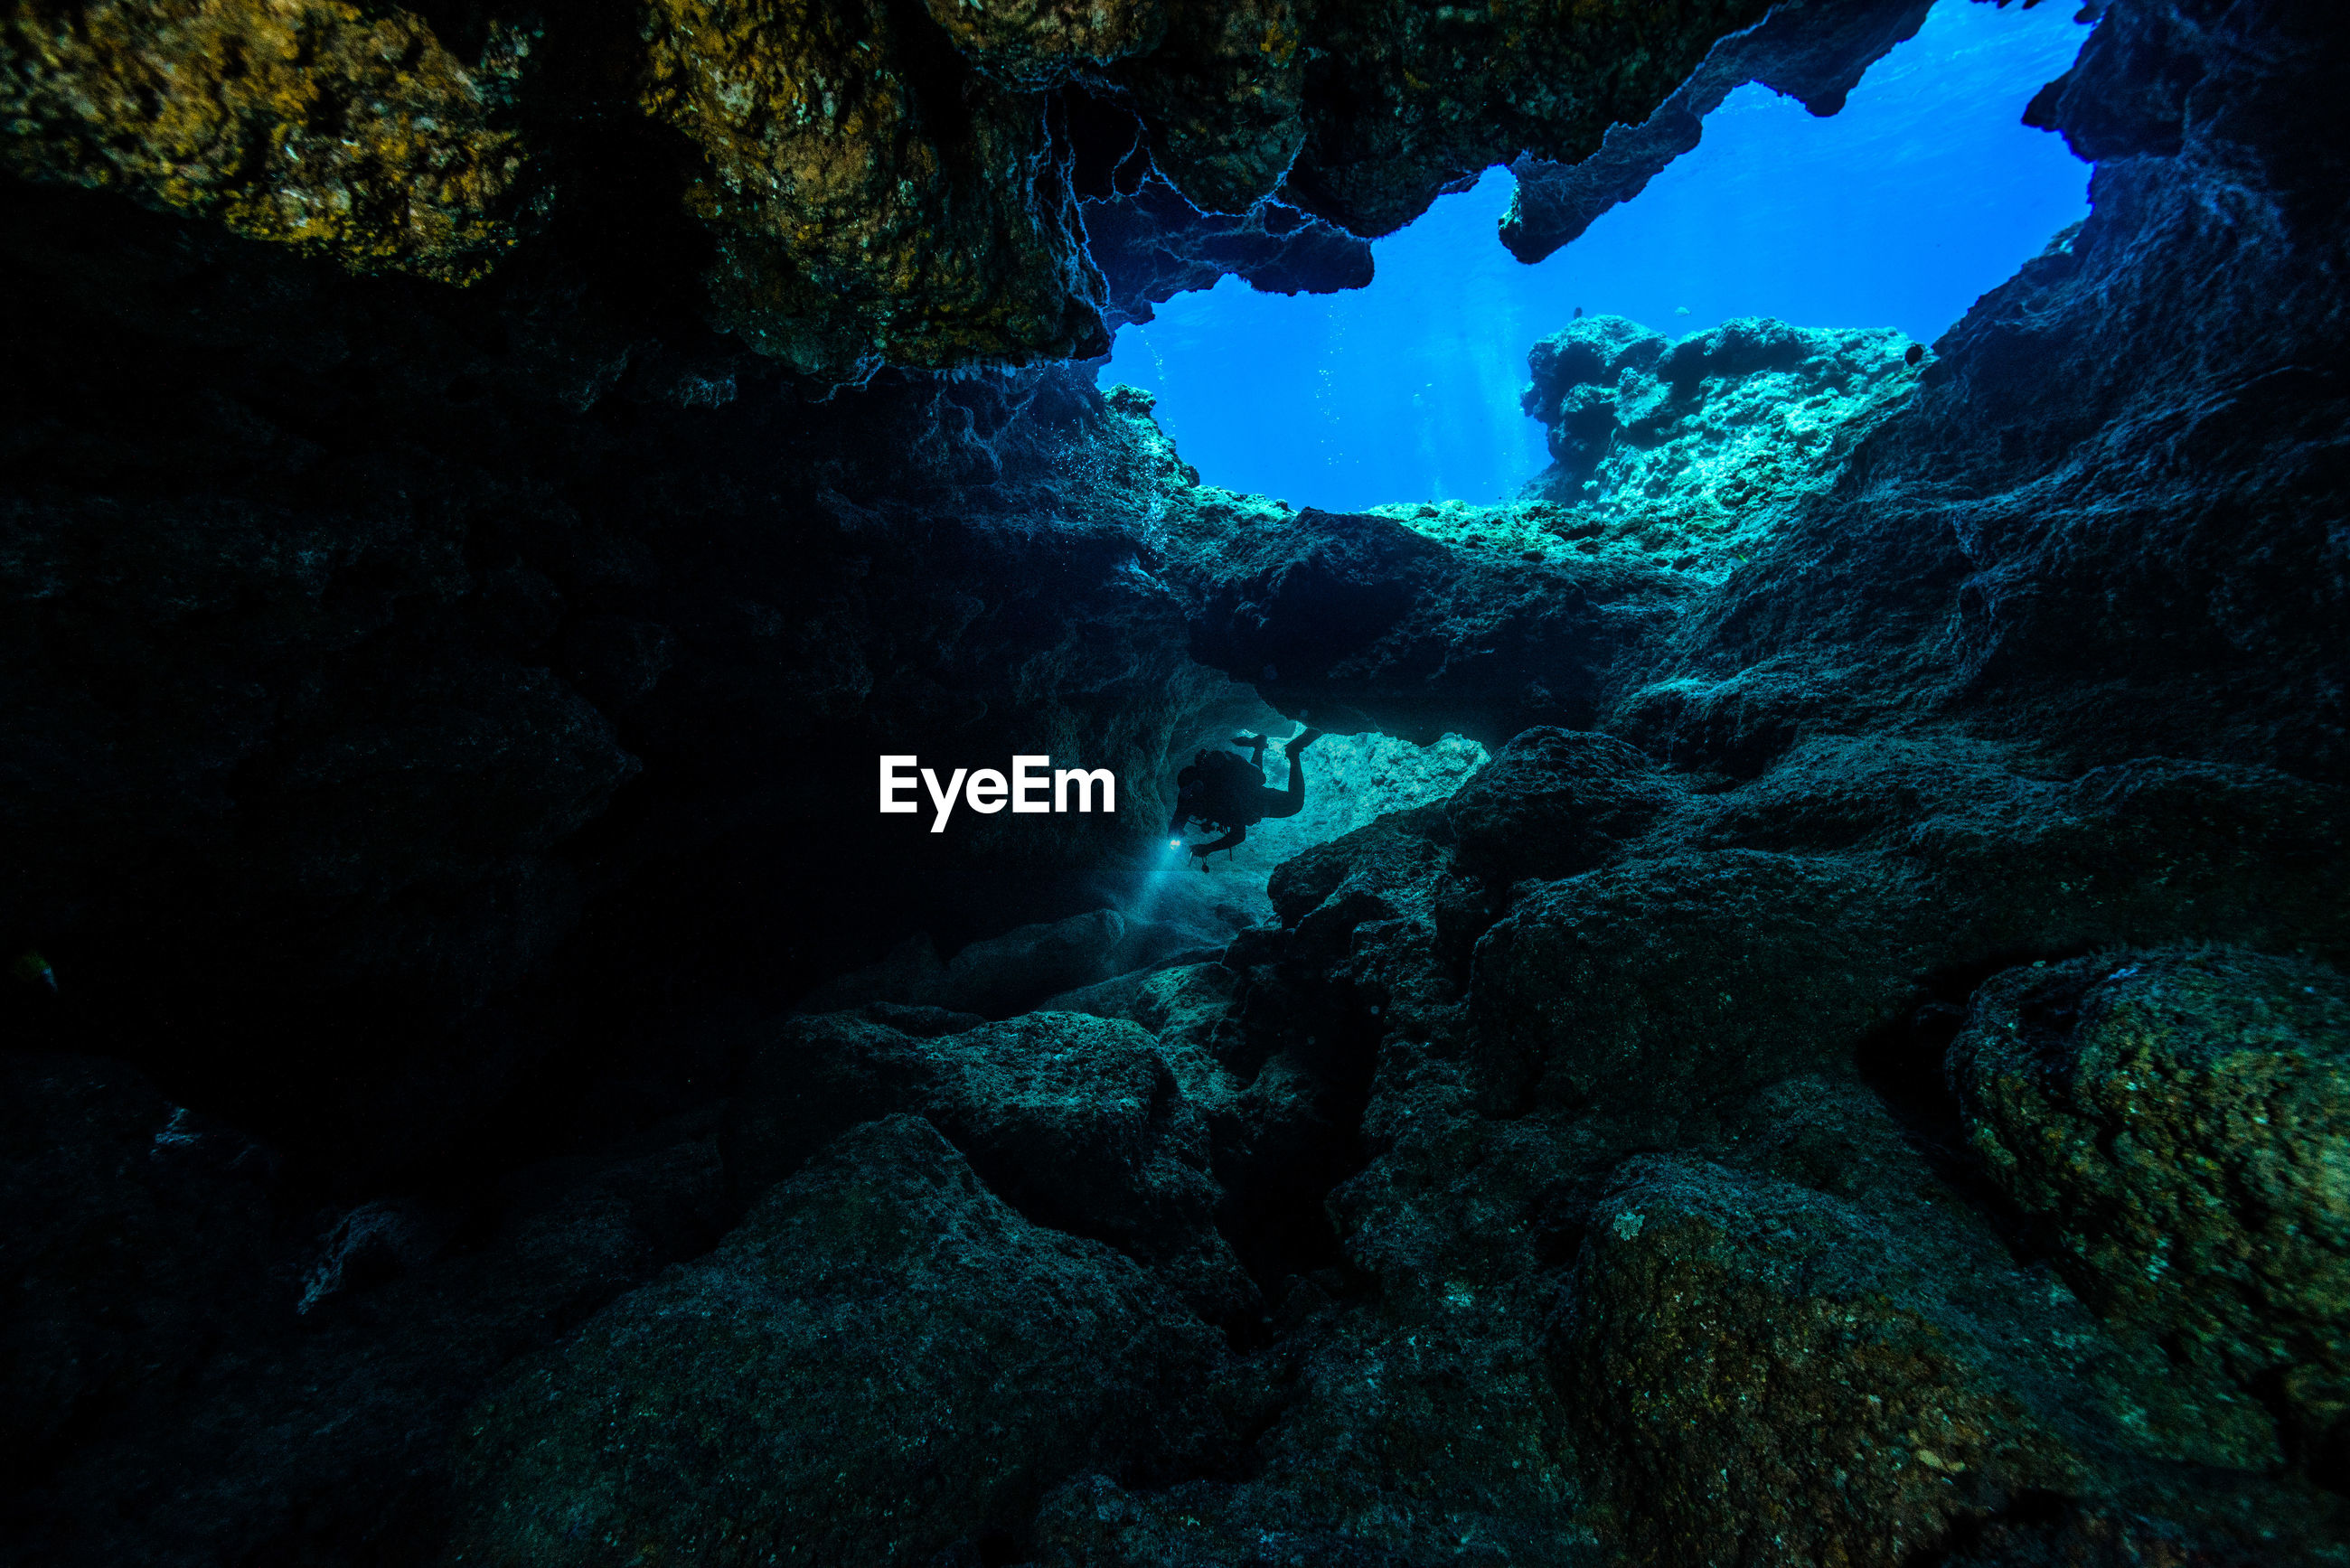 View of unerwater scenery